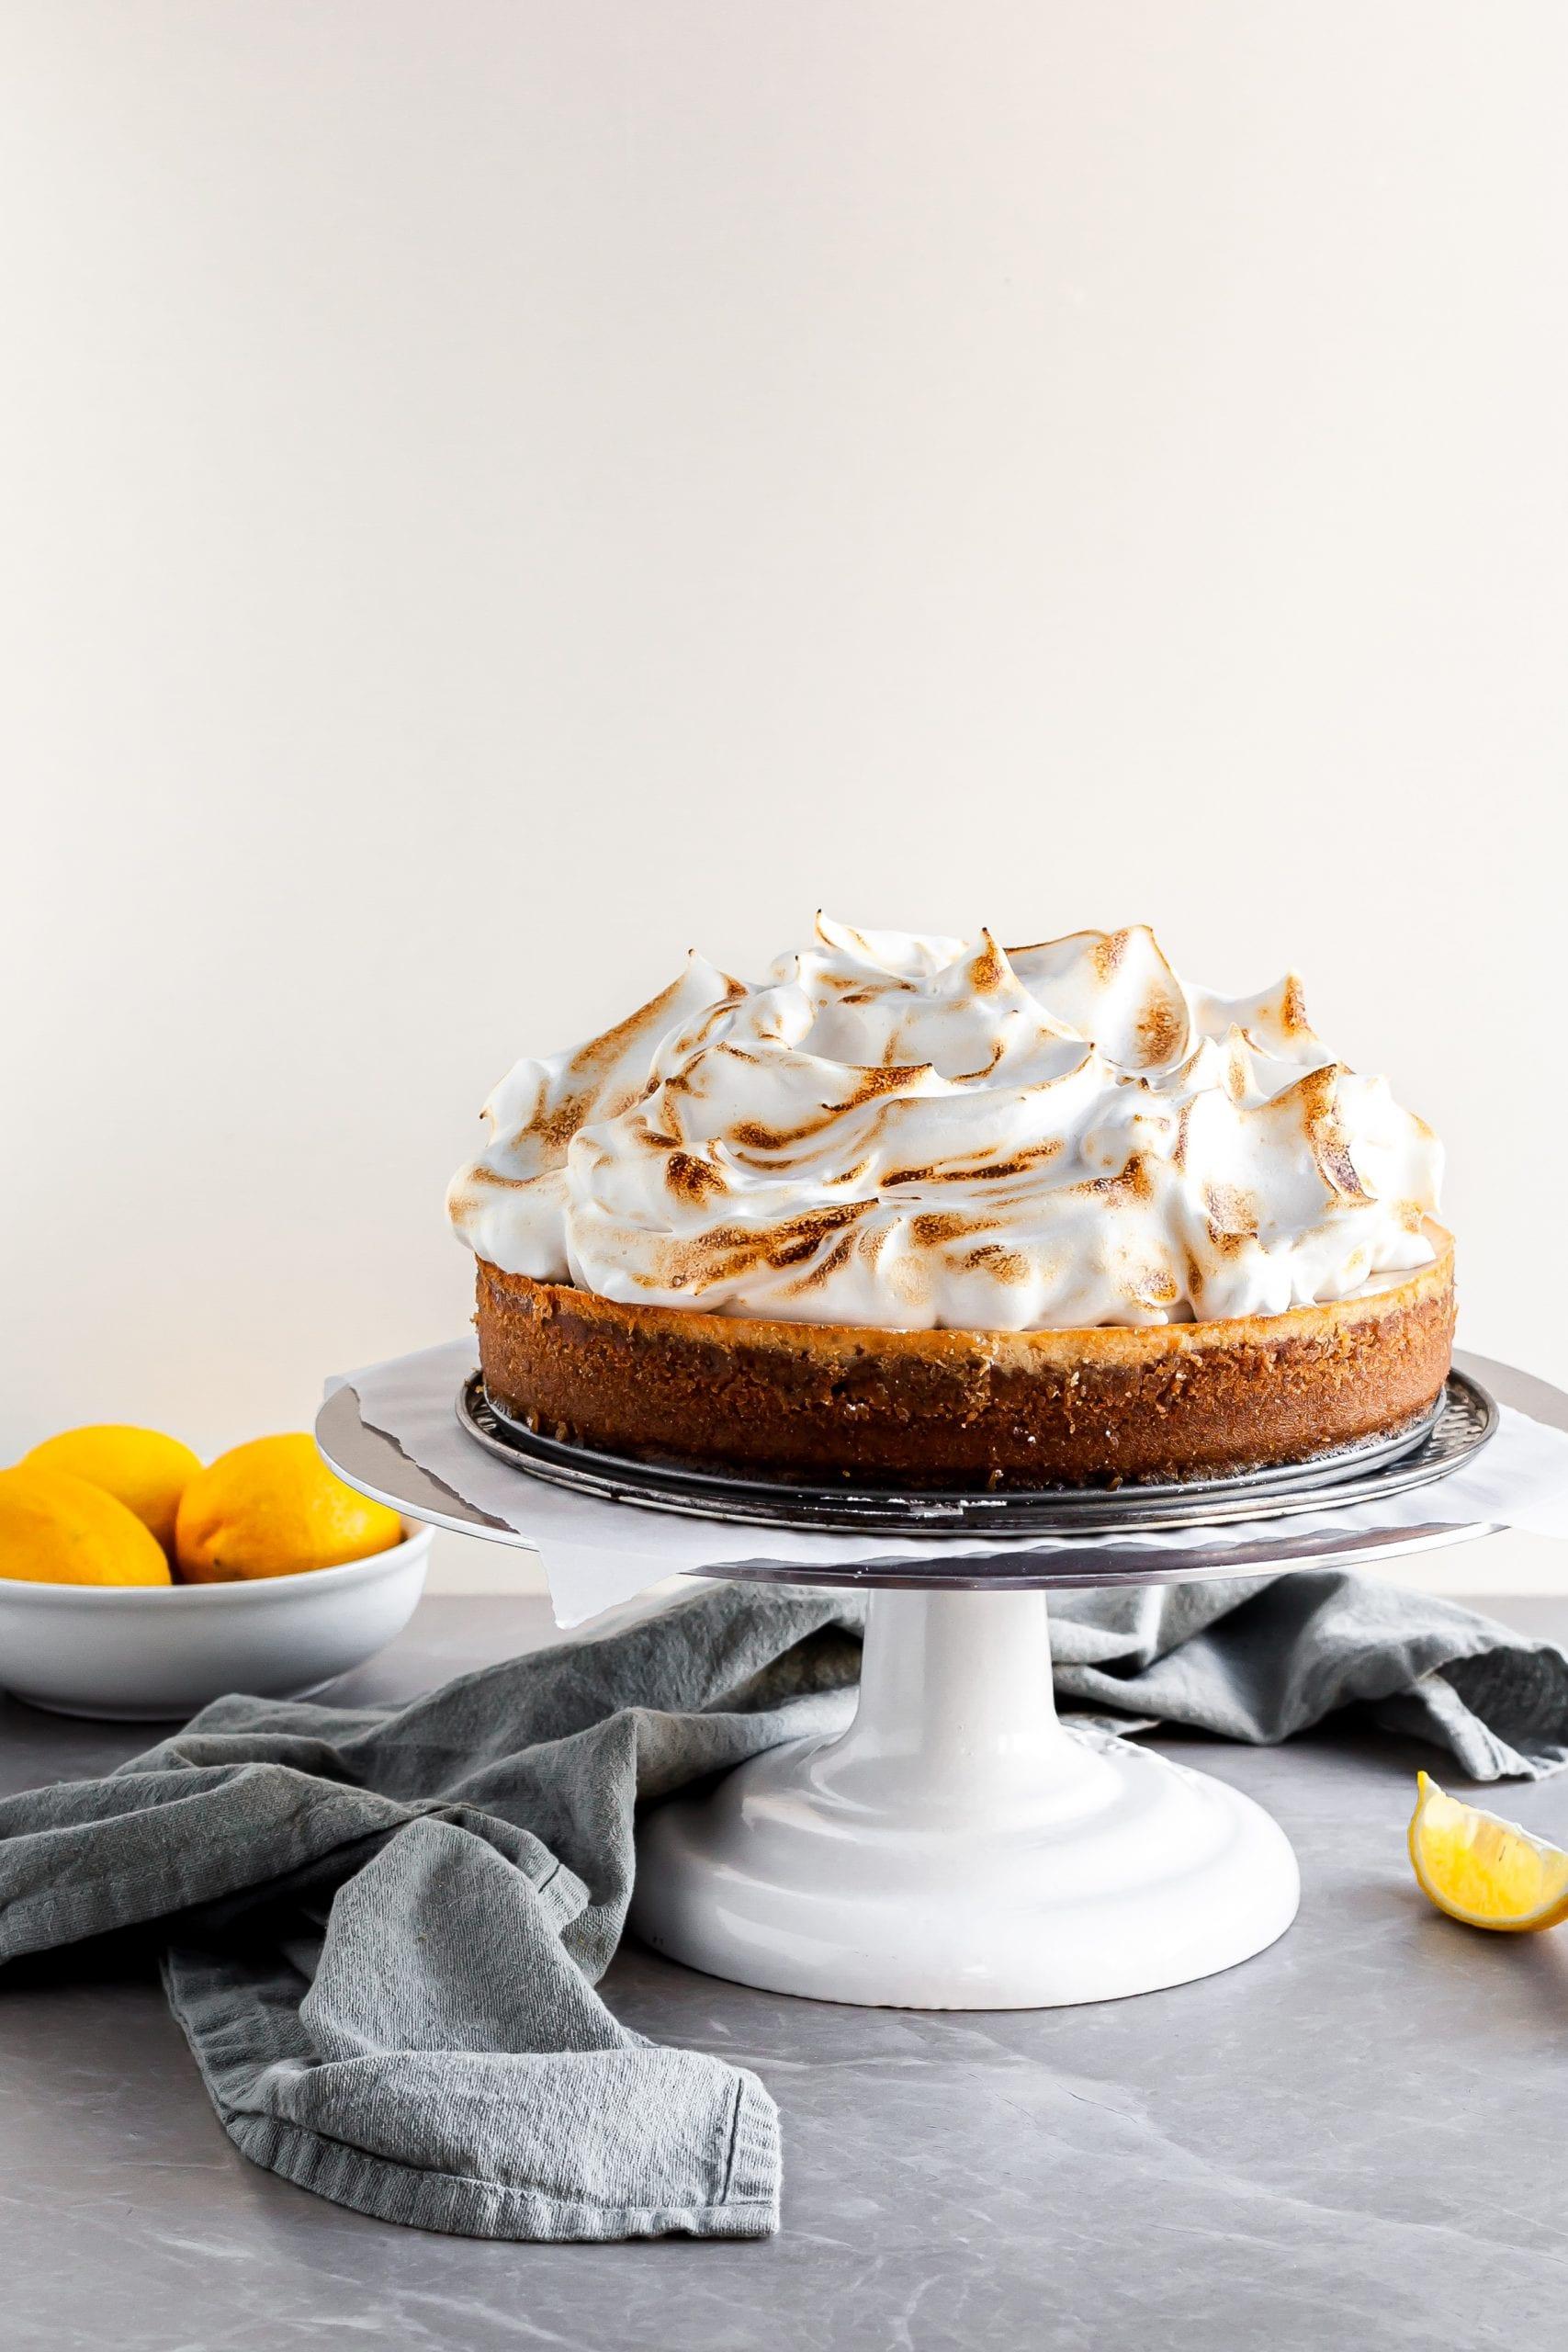 Vegan Lemon Meringue Cheesecake on a white cake stand beside a bowl of lemons